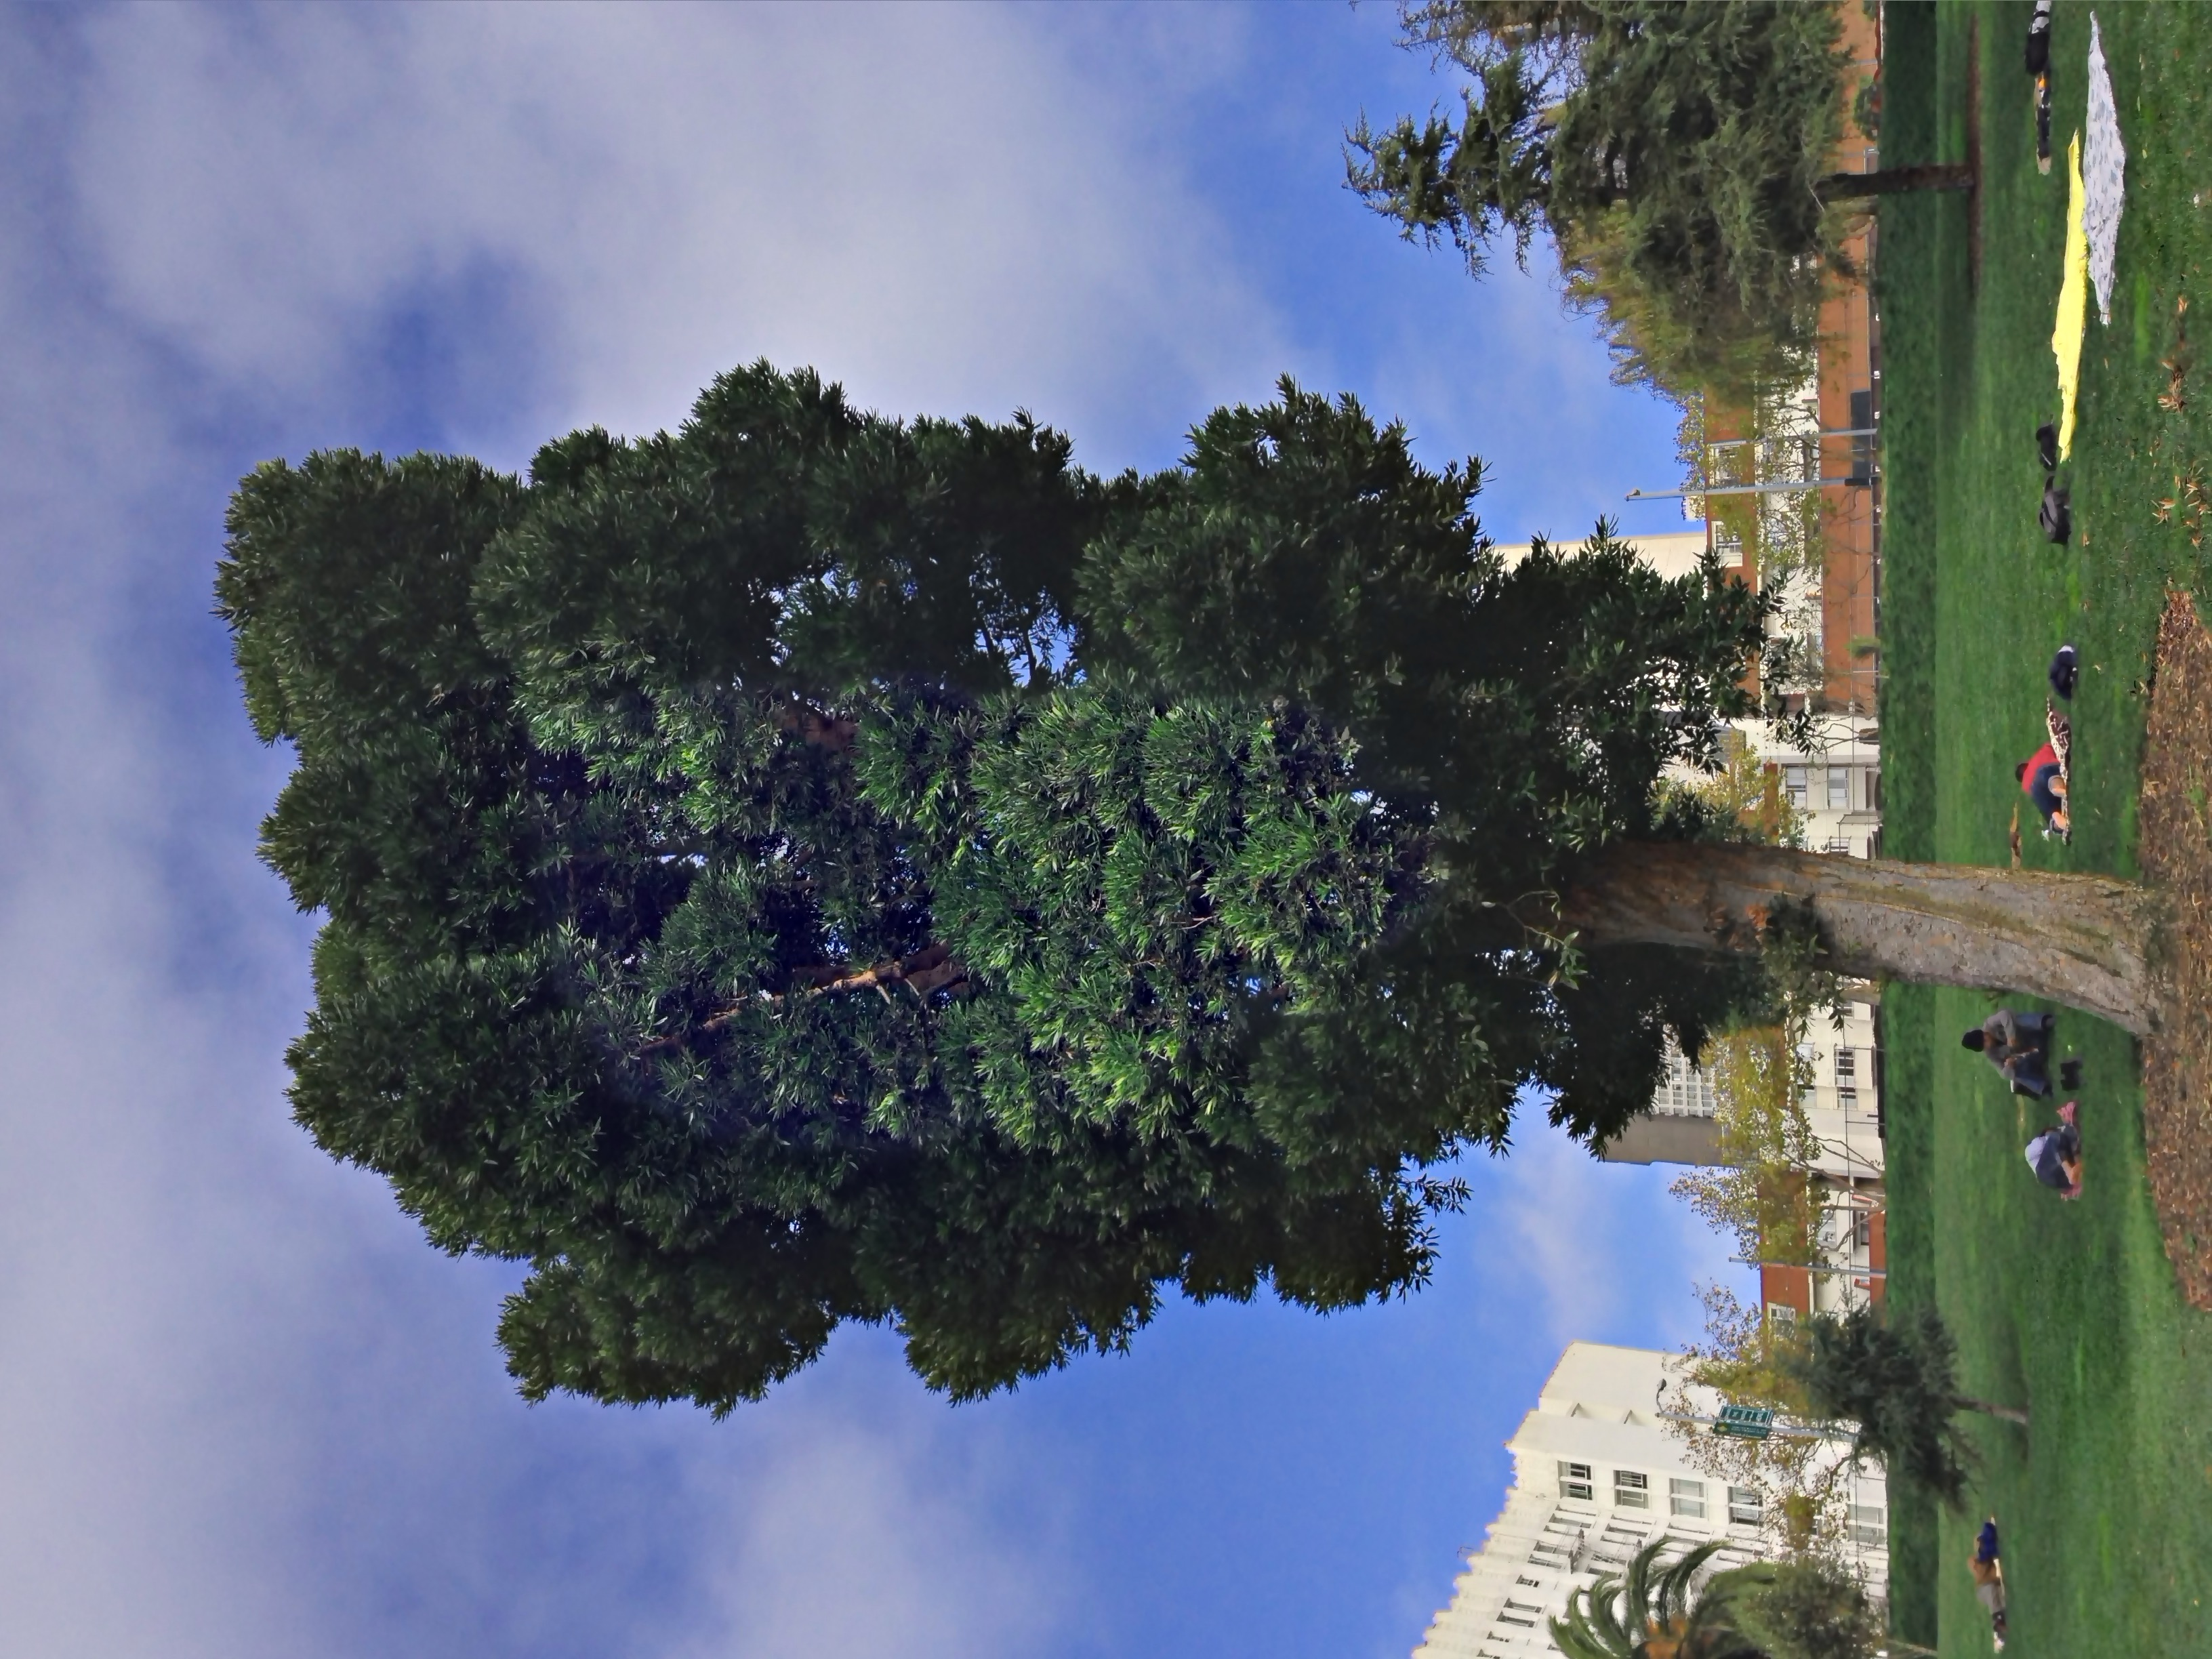 Jefferson Square Park - Queensland kauri